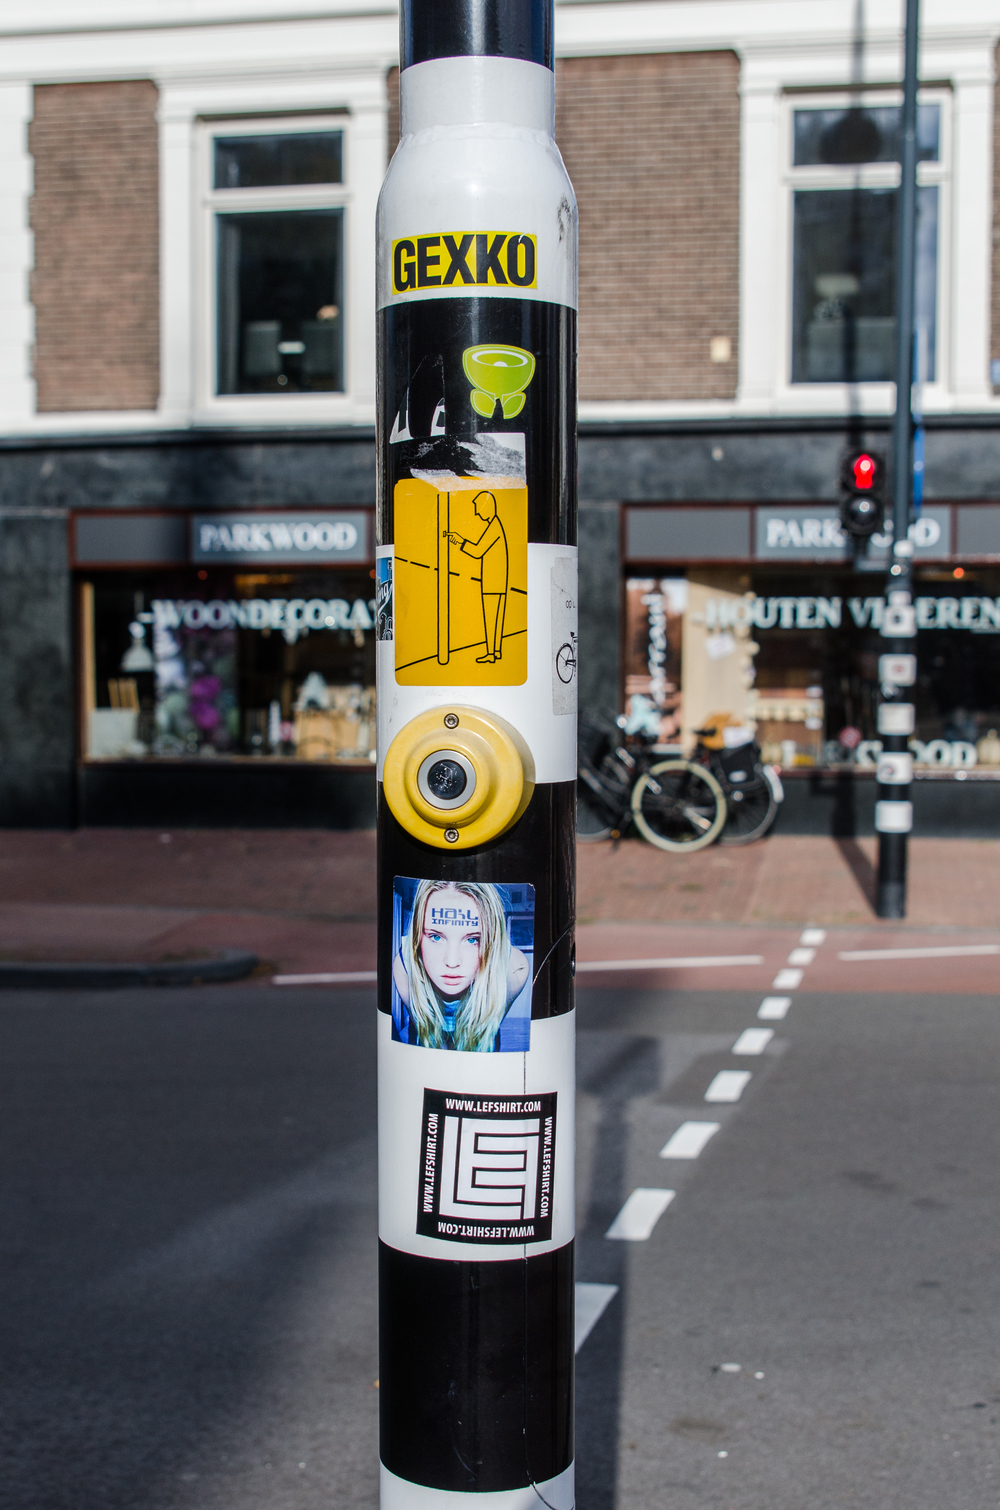 Haarlem-37.jpg